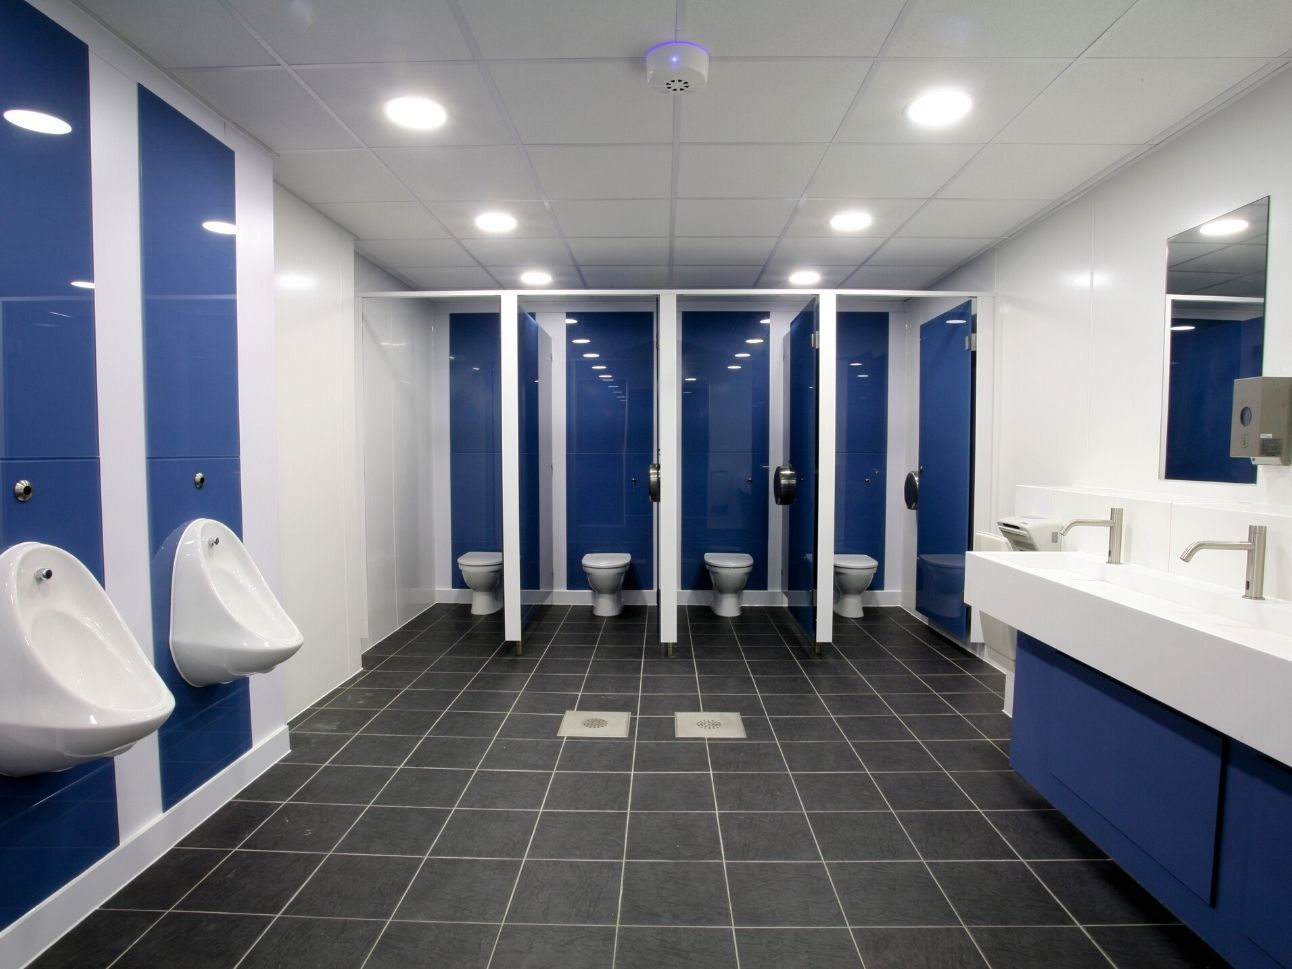 School Washroom Refurbishment In Term Time